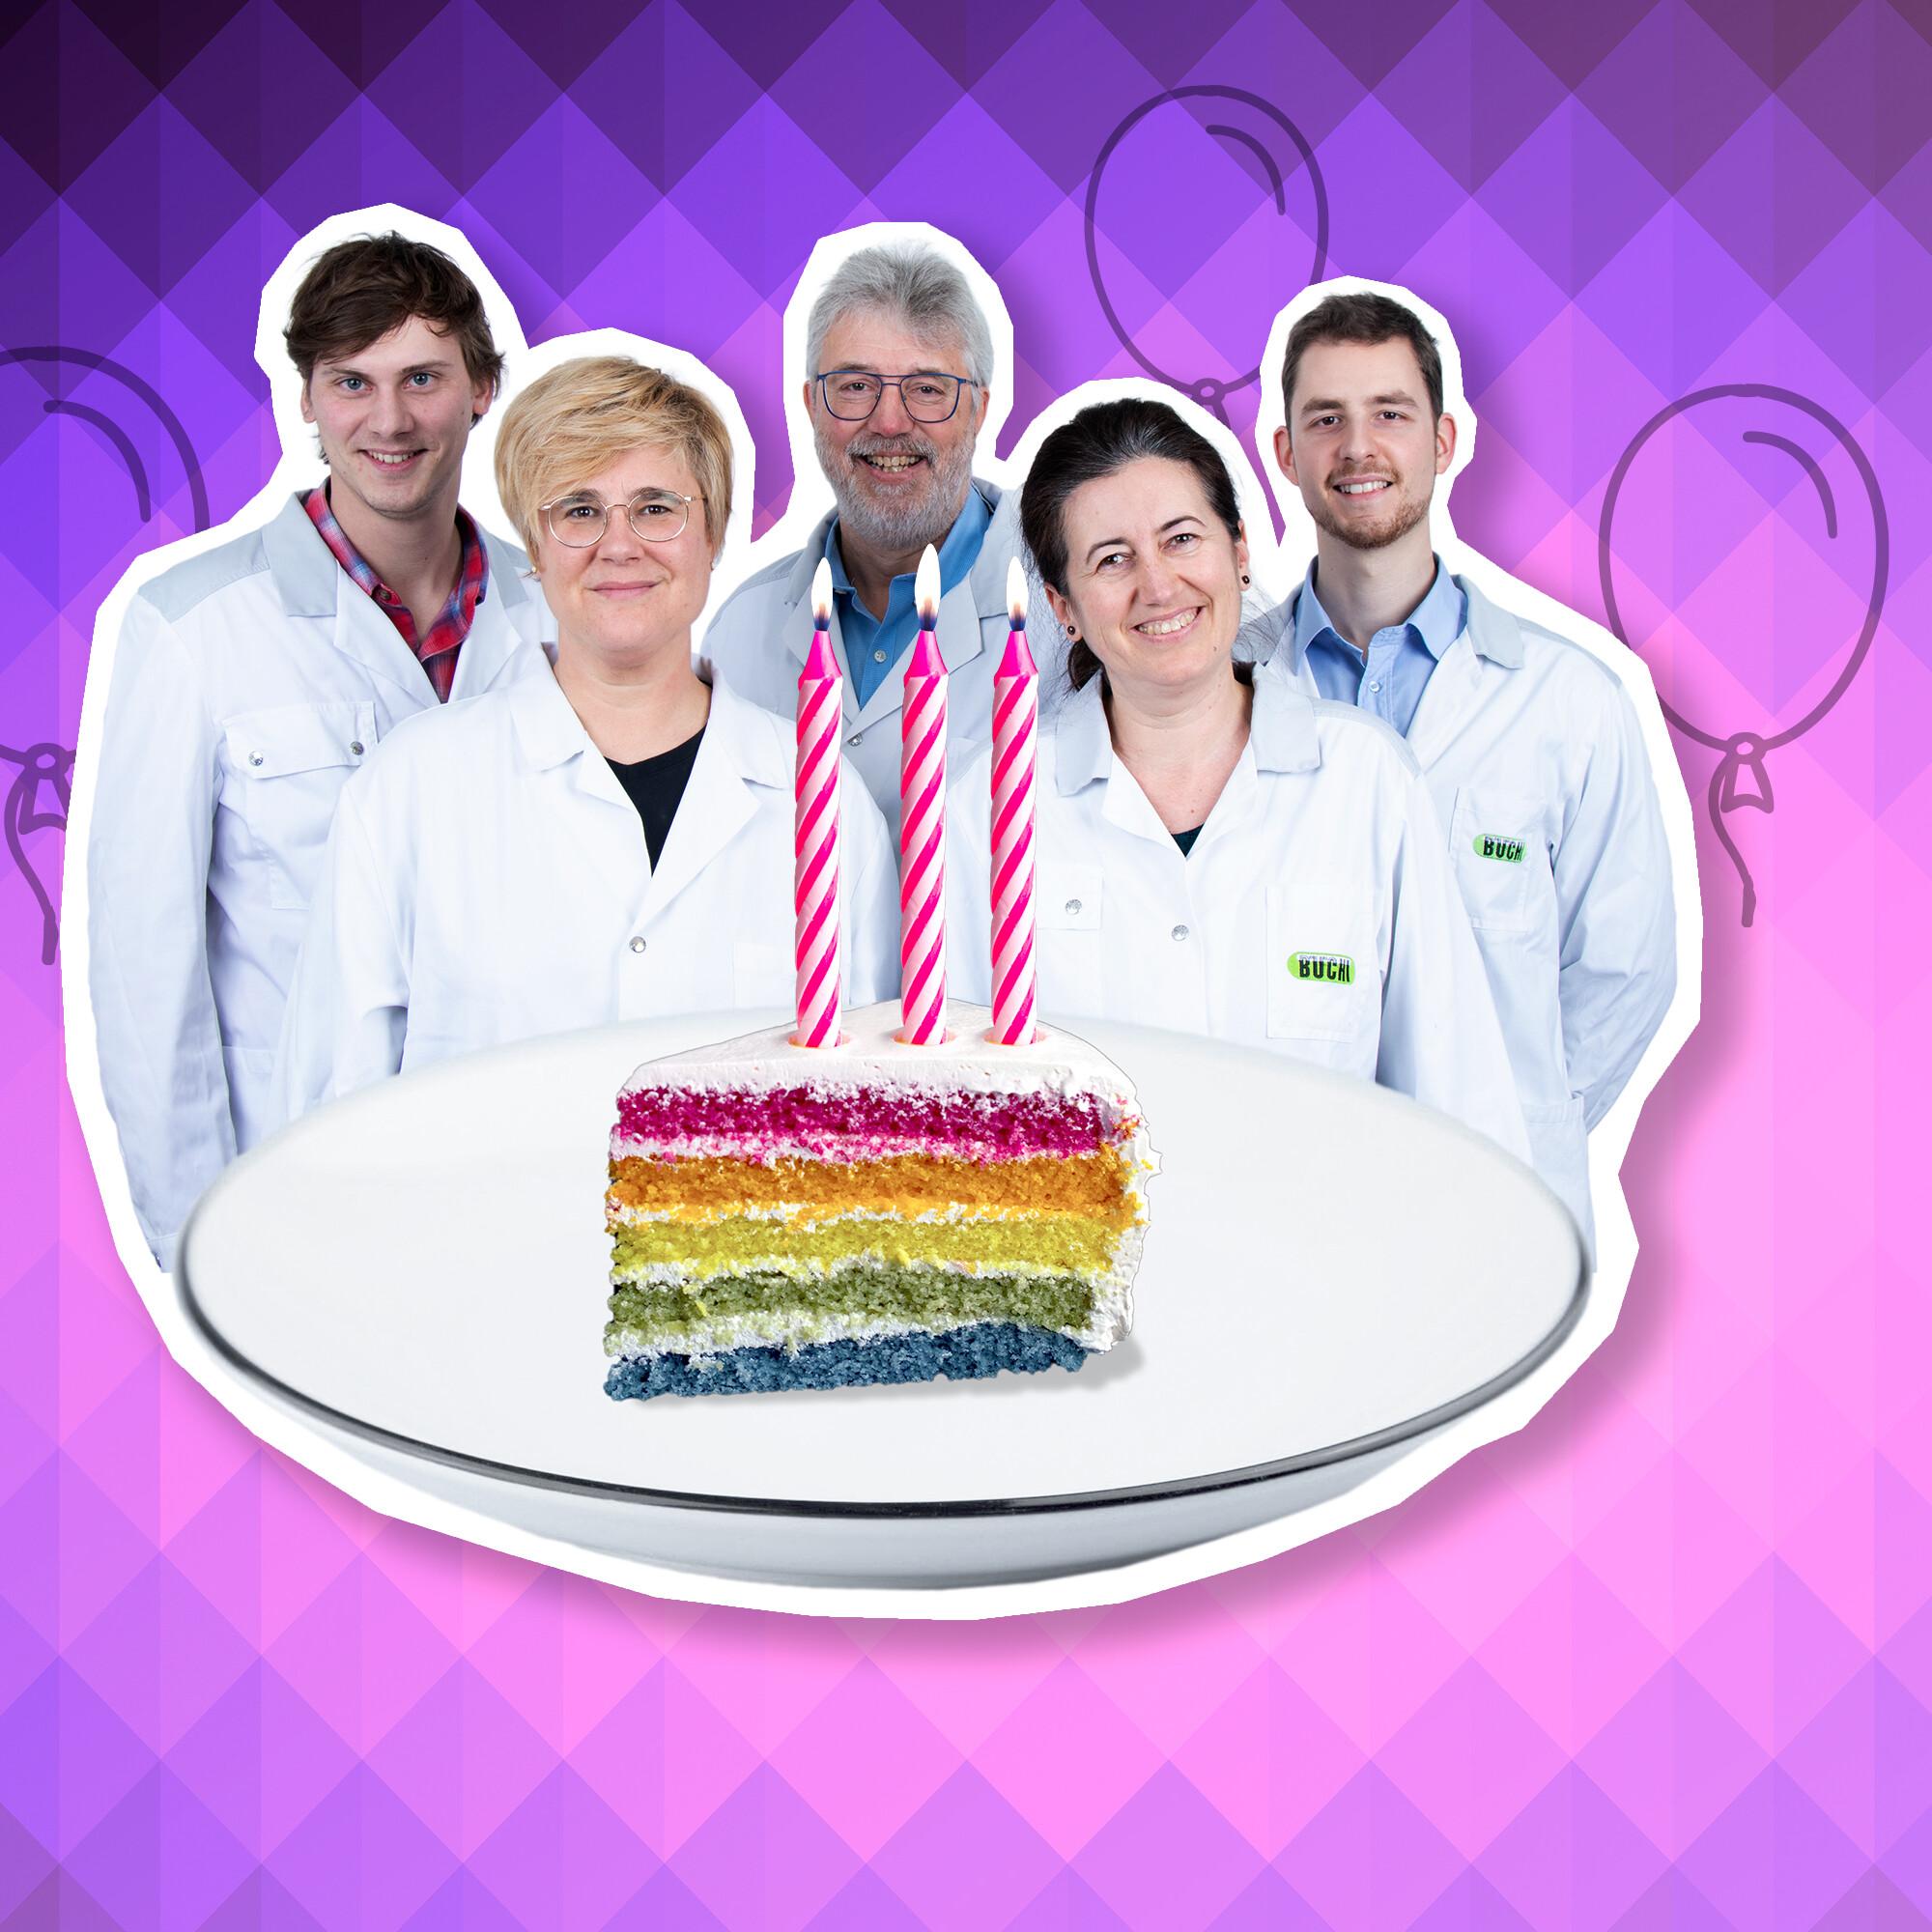 chromatography, rotary evaporation, flash chromatography, prep HPLC, preparative chromatography, accessories, lab evaporation